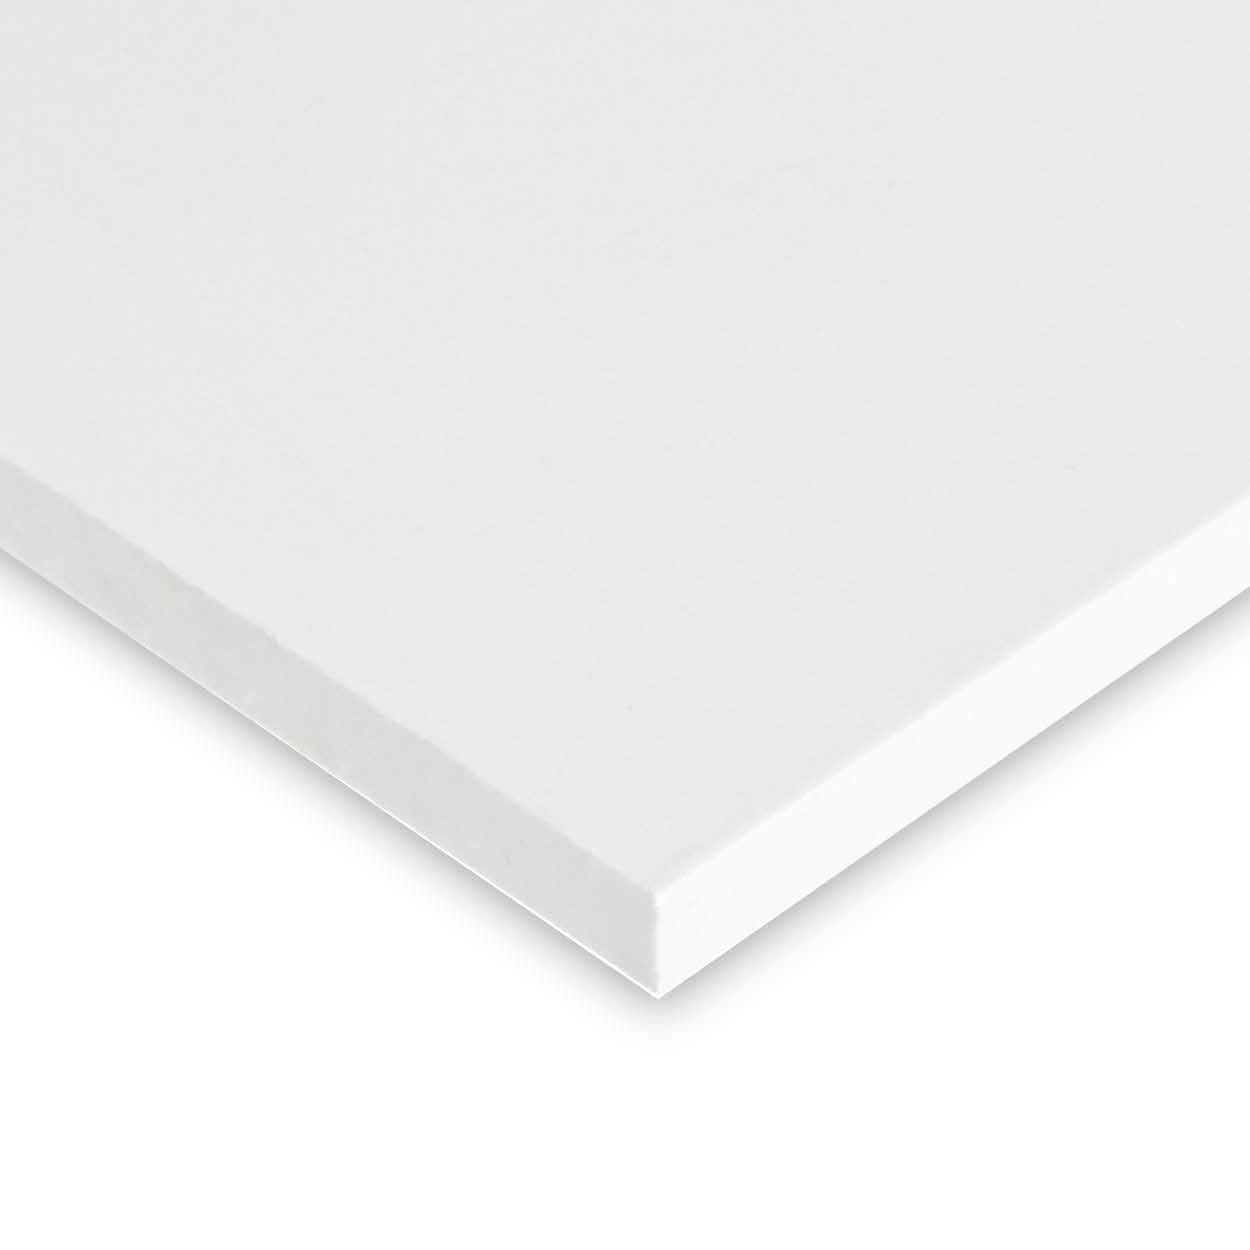 "PTFE Teflon Sheet .750"" x 1"" x 24"""